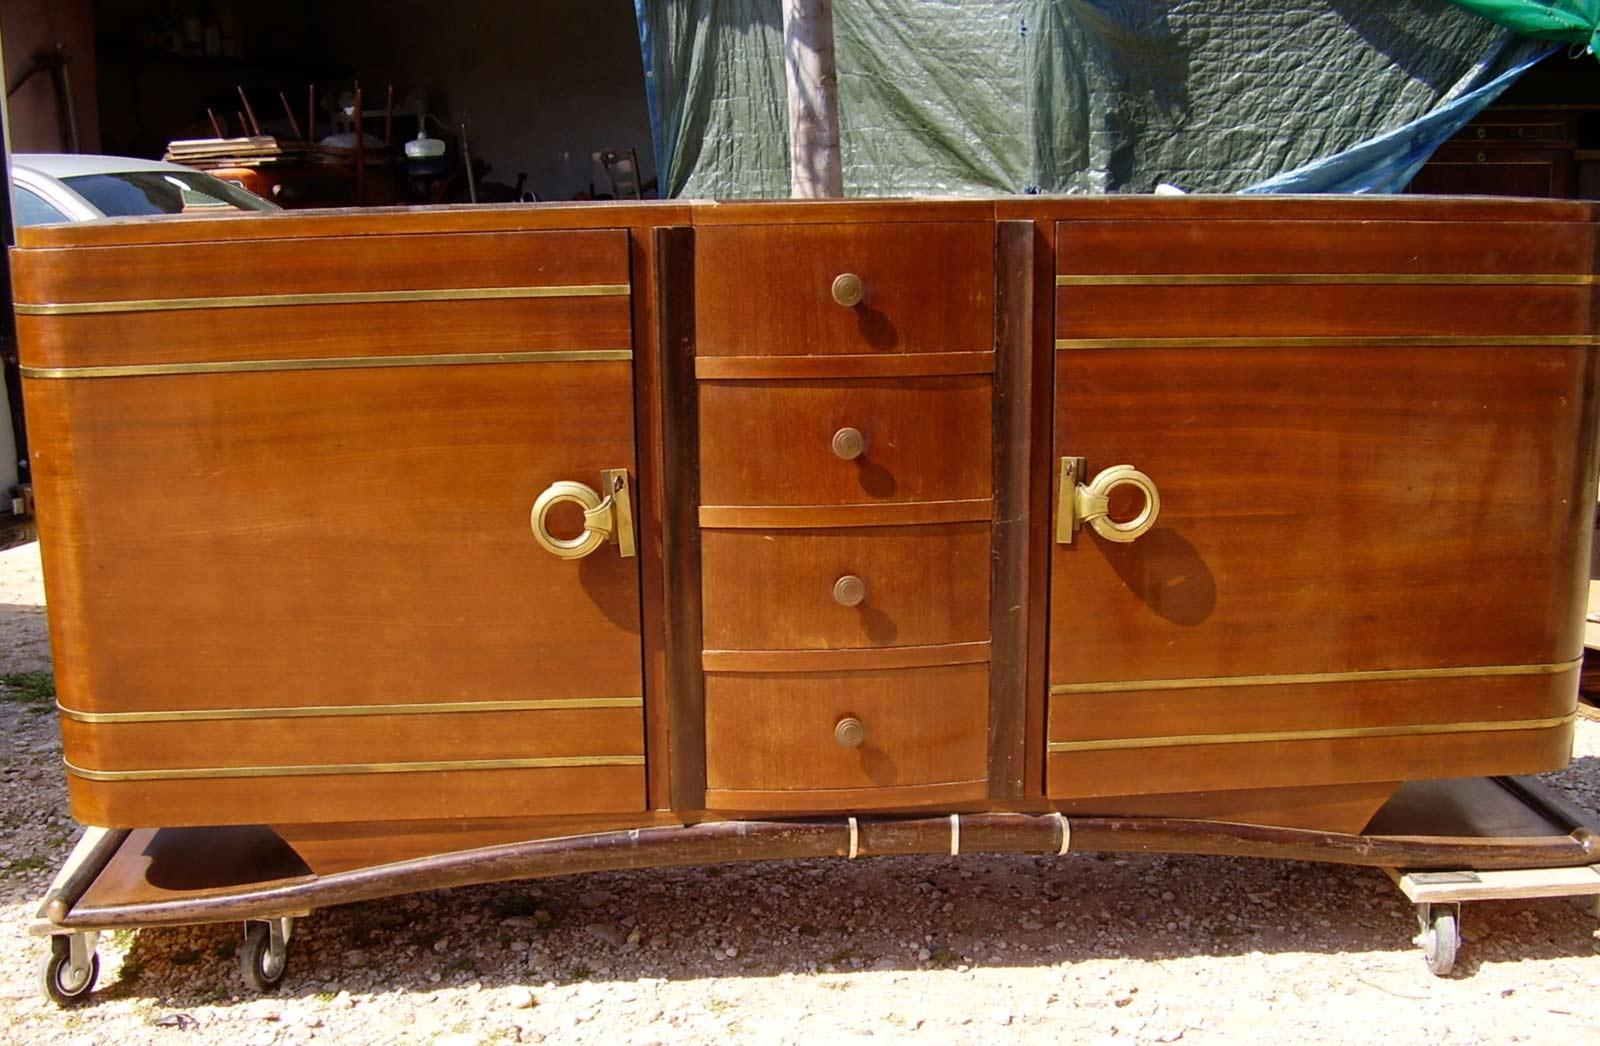 enfilade sideboard en acajou art d co ref enf 11 esprit art d co vente meubles art d co 1930. Black Bedroom Furniture Sets. Home Design Ideas